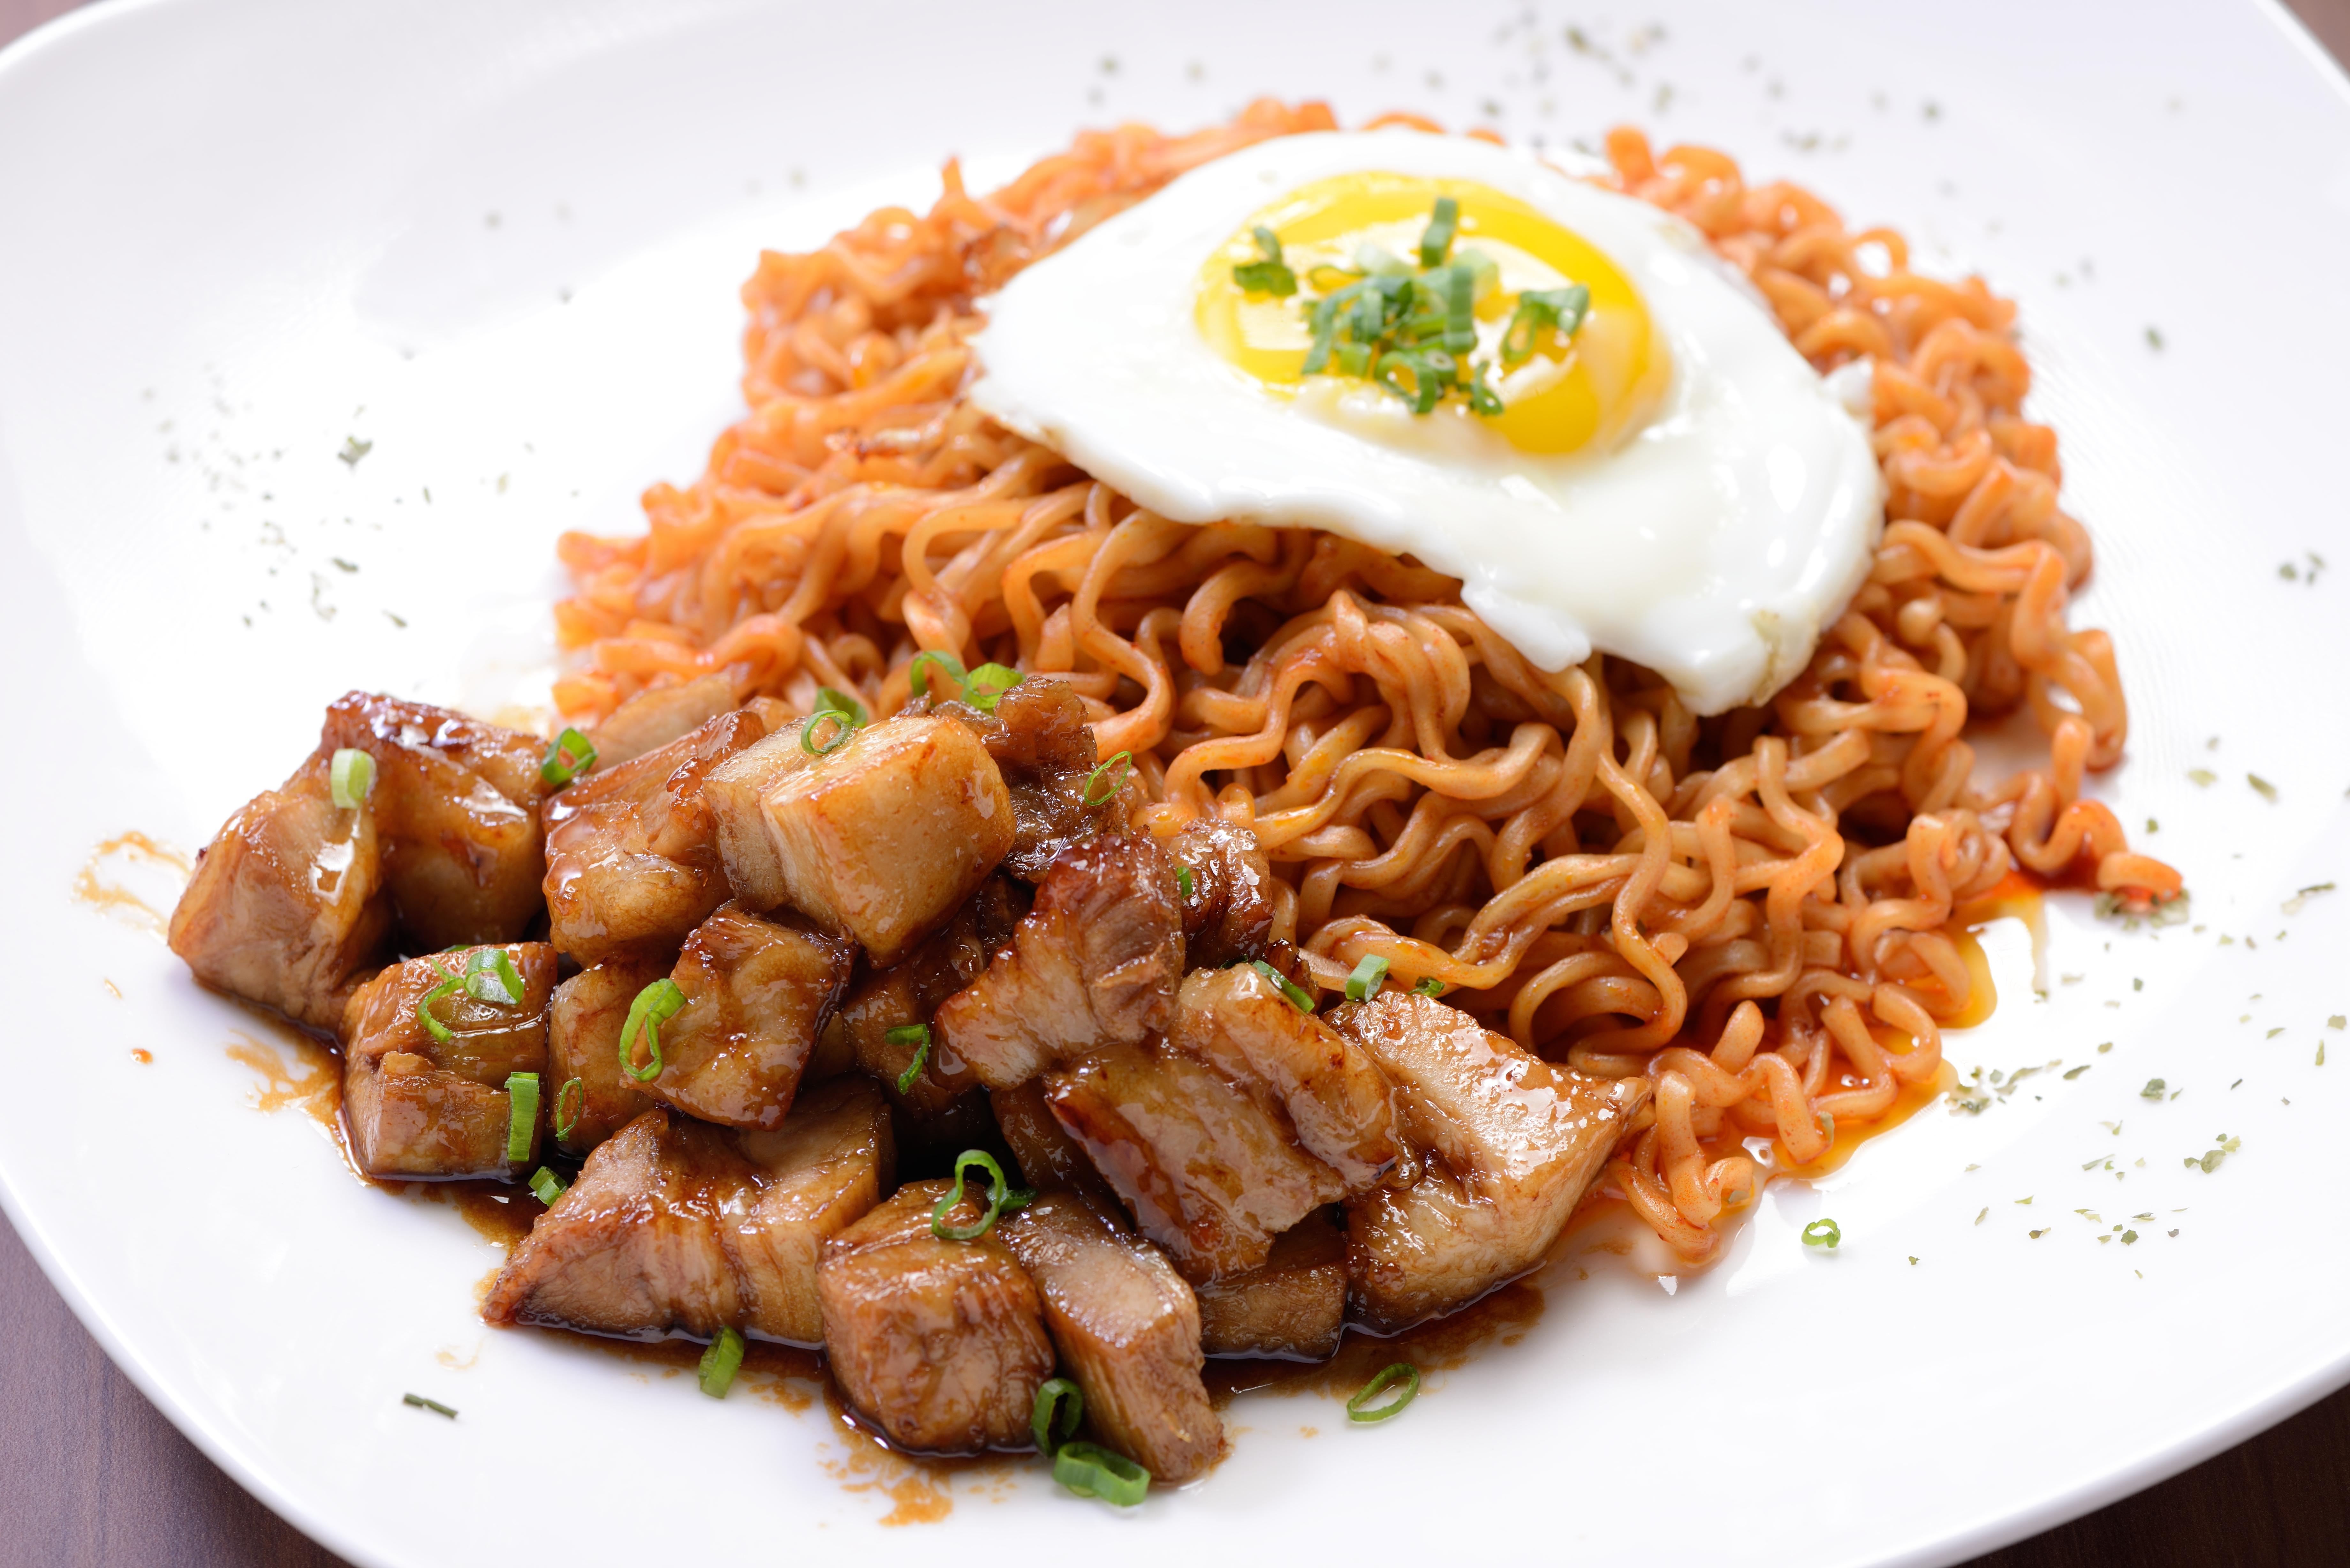 Noodles Getty Images